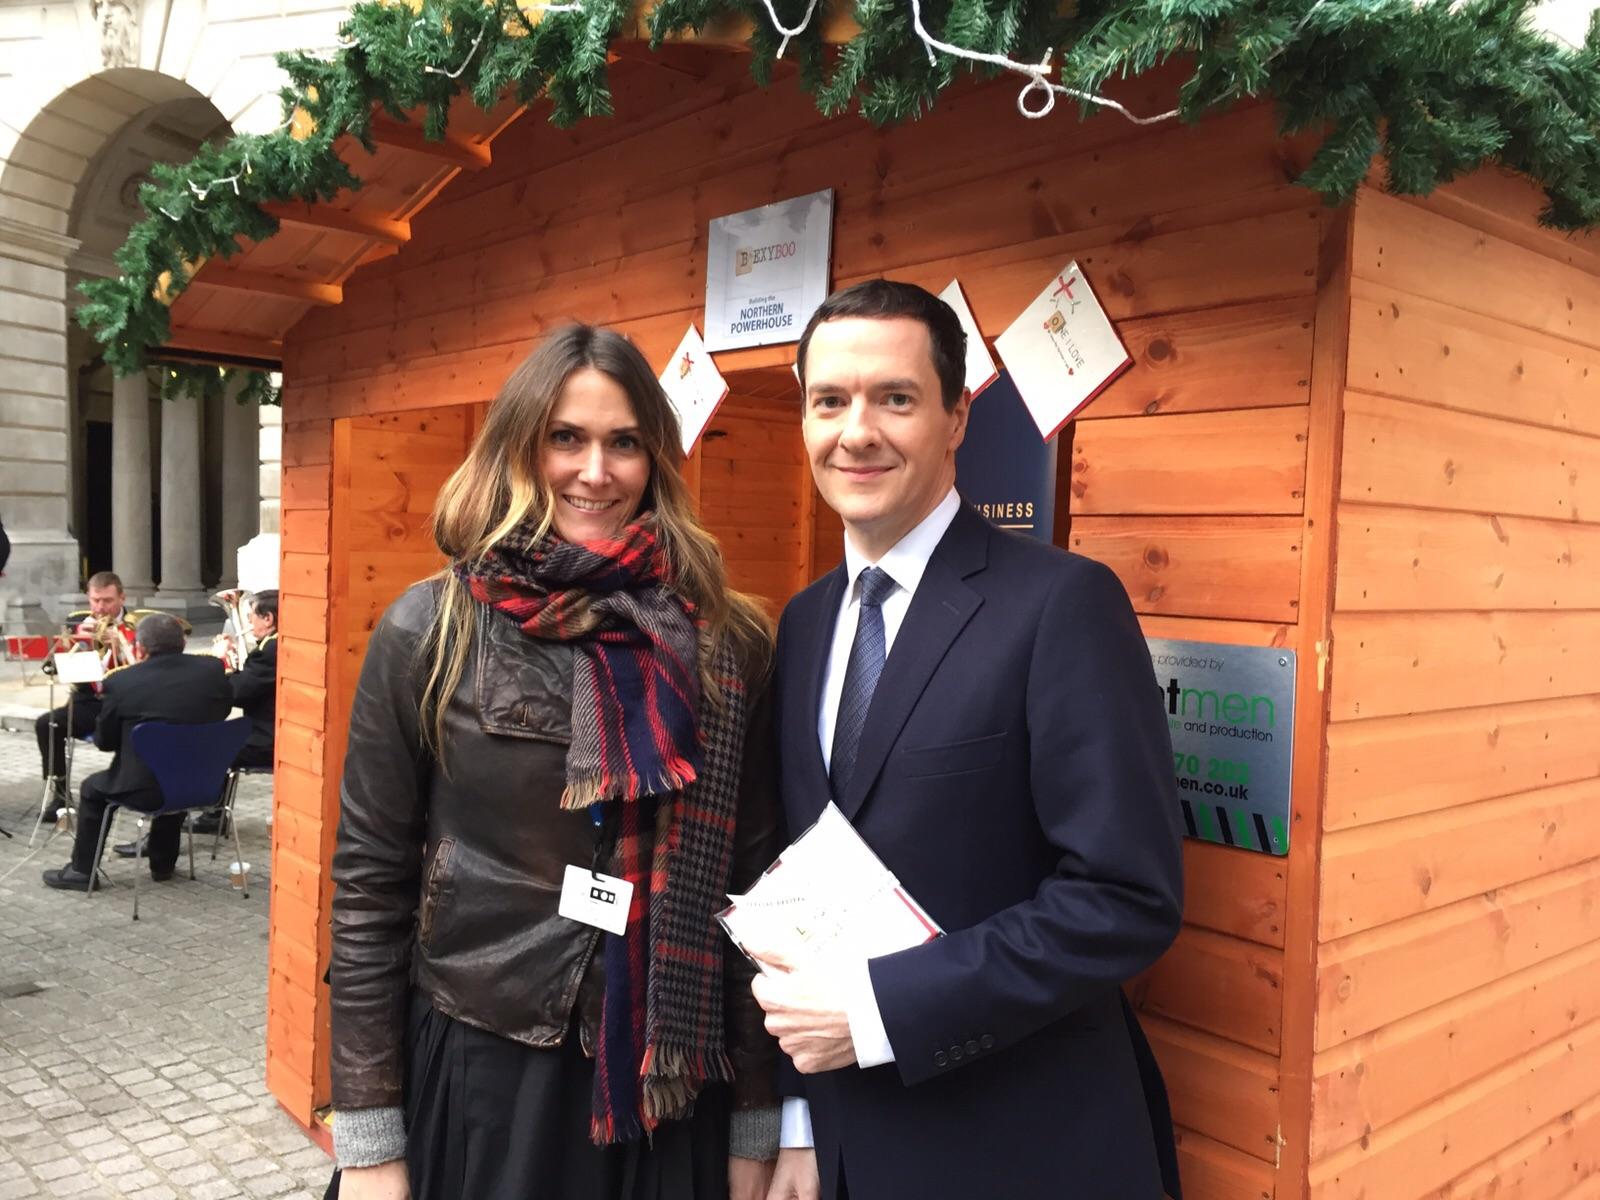 George Osborne & Bex from Bexy Boo